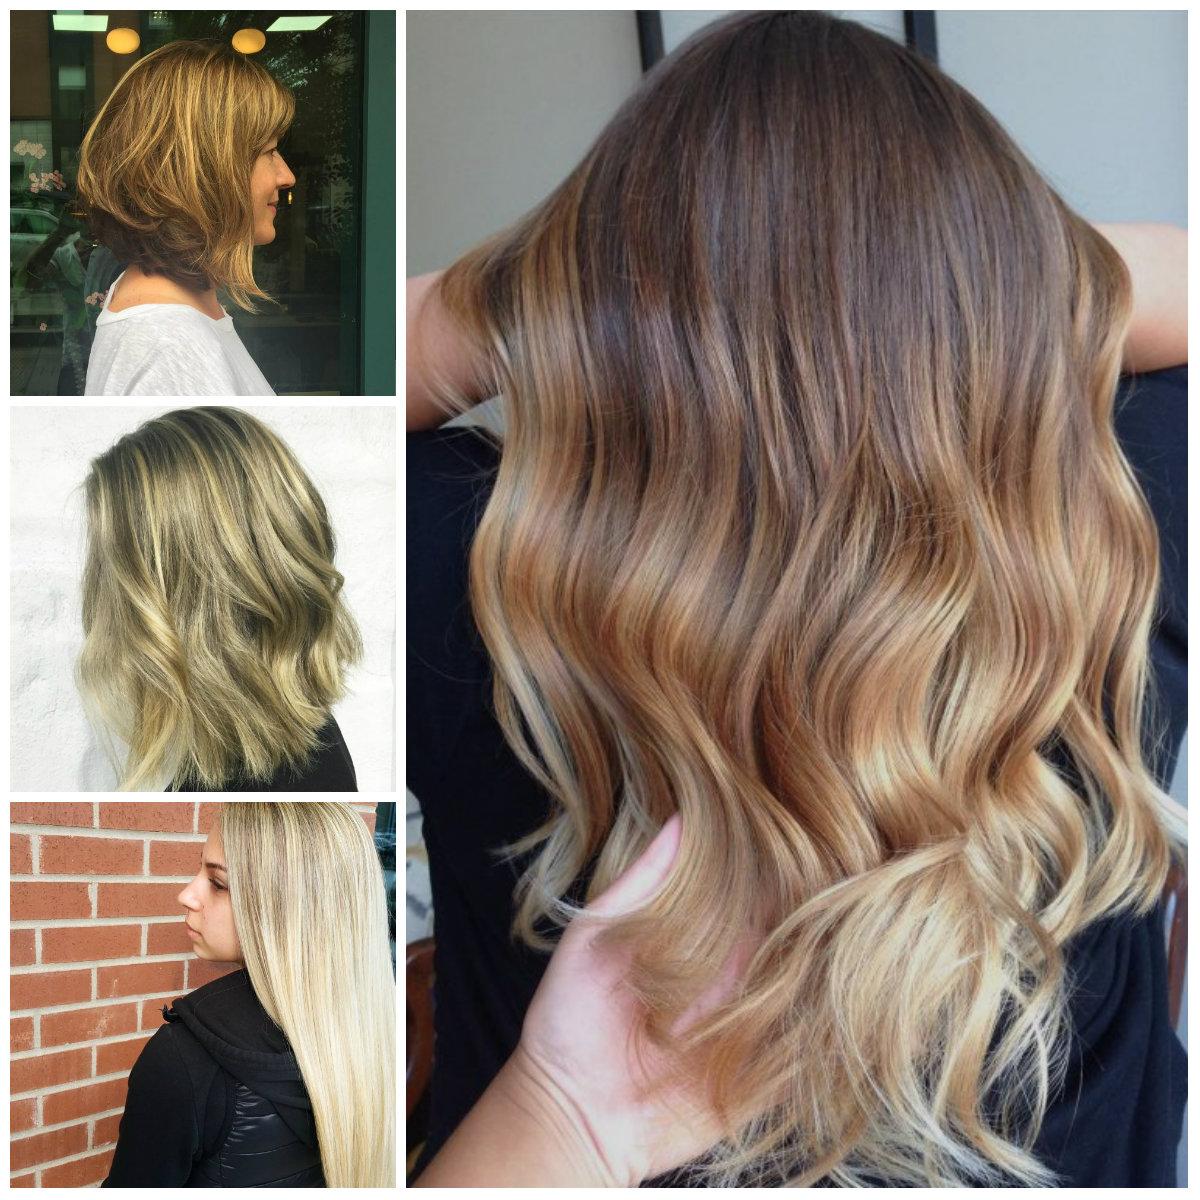 Breathtaking Sandy Blonde Hair Ideas for 2022